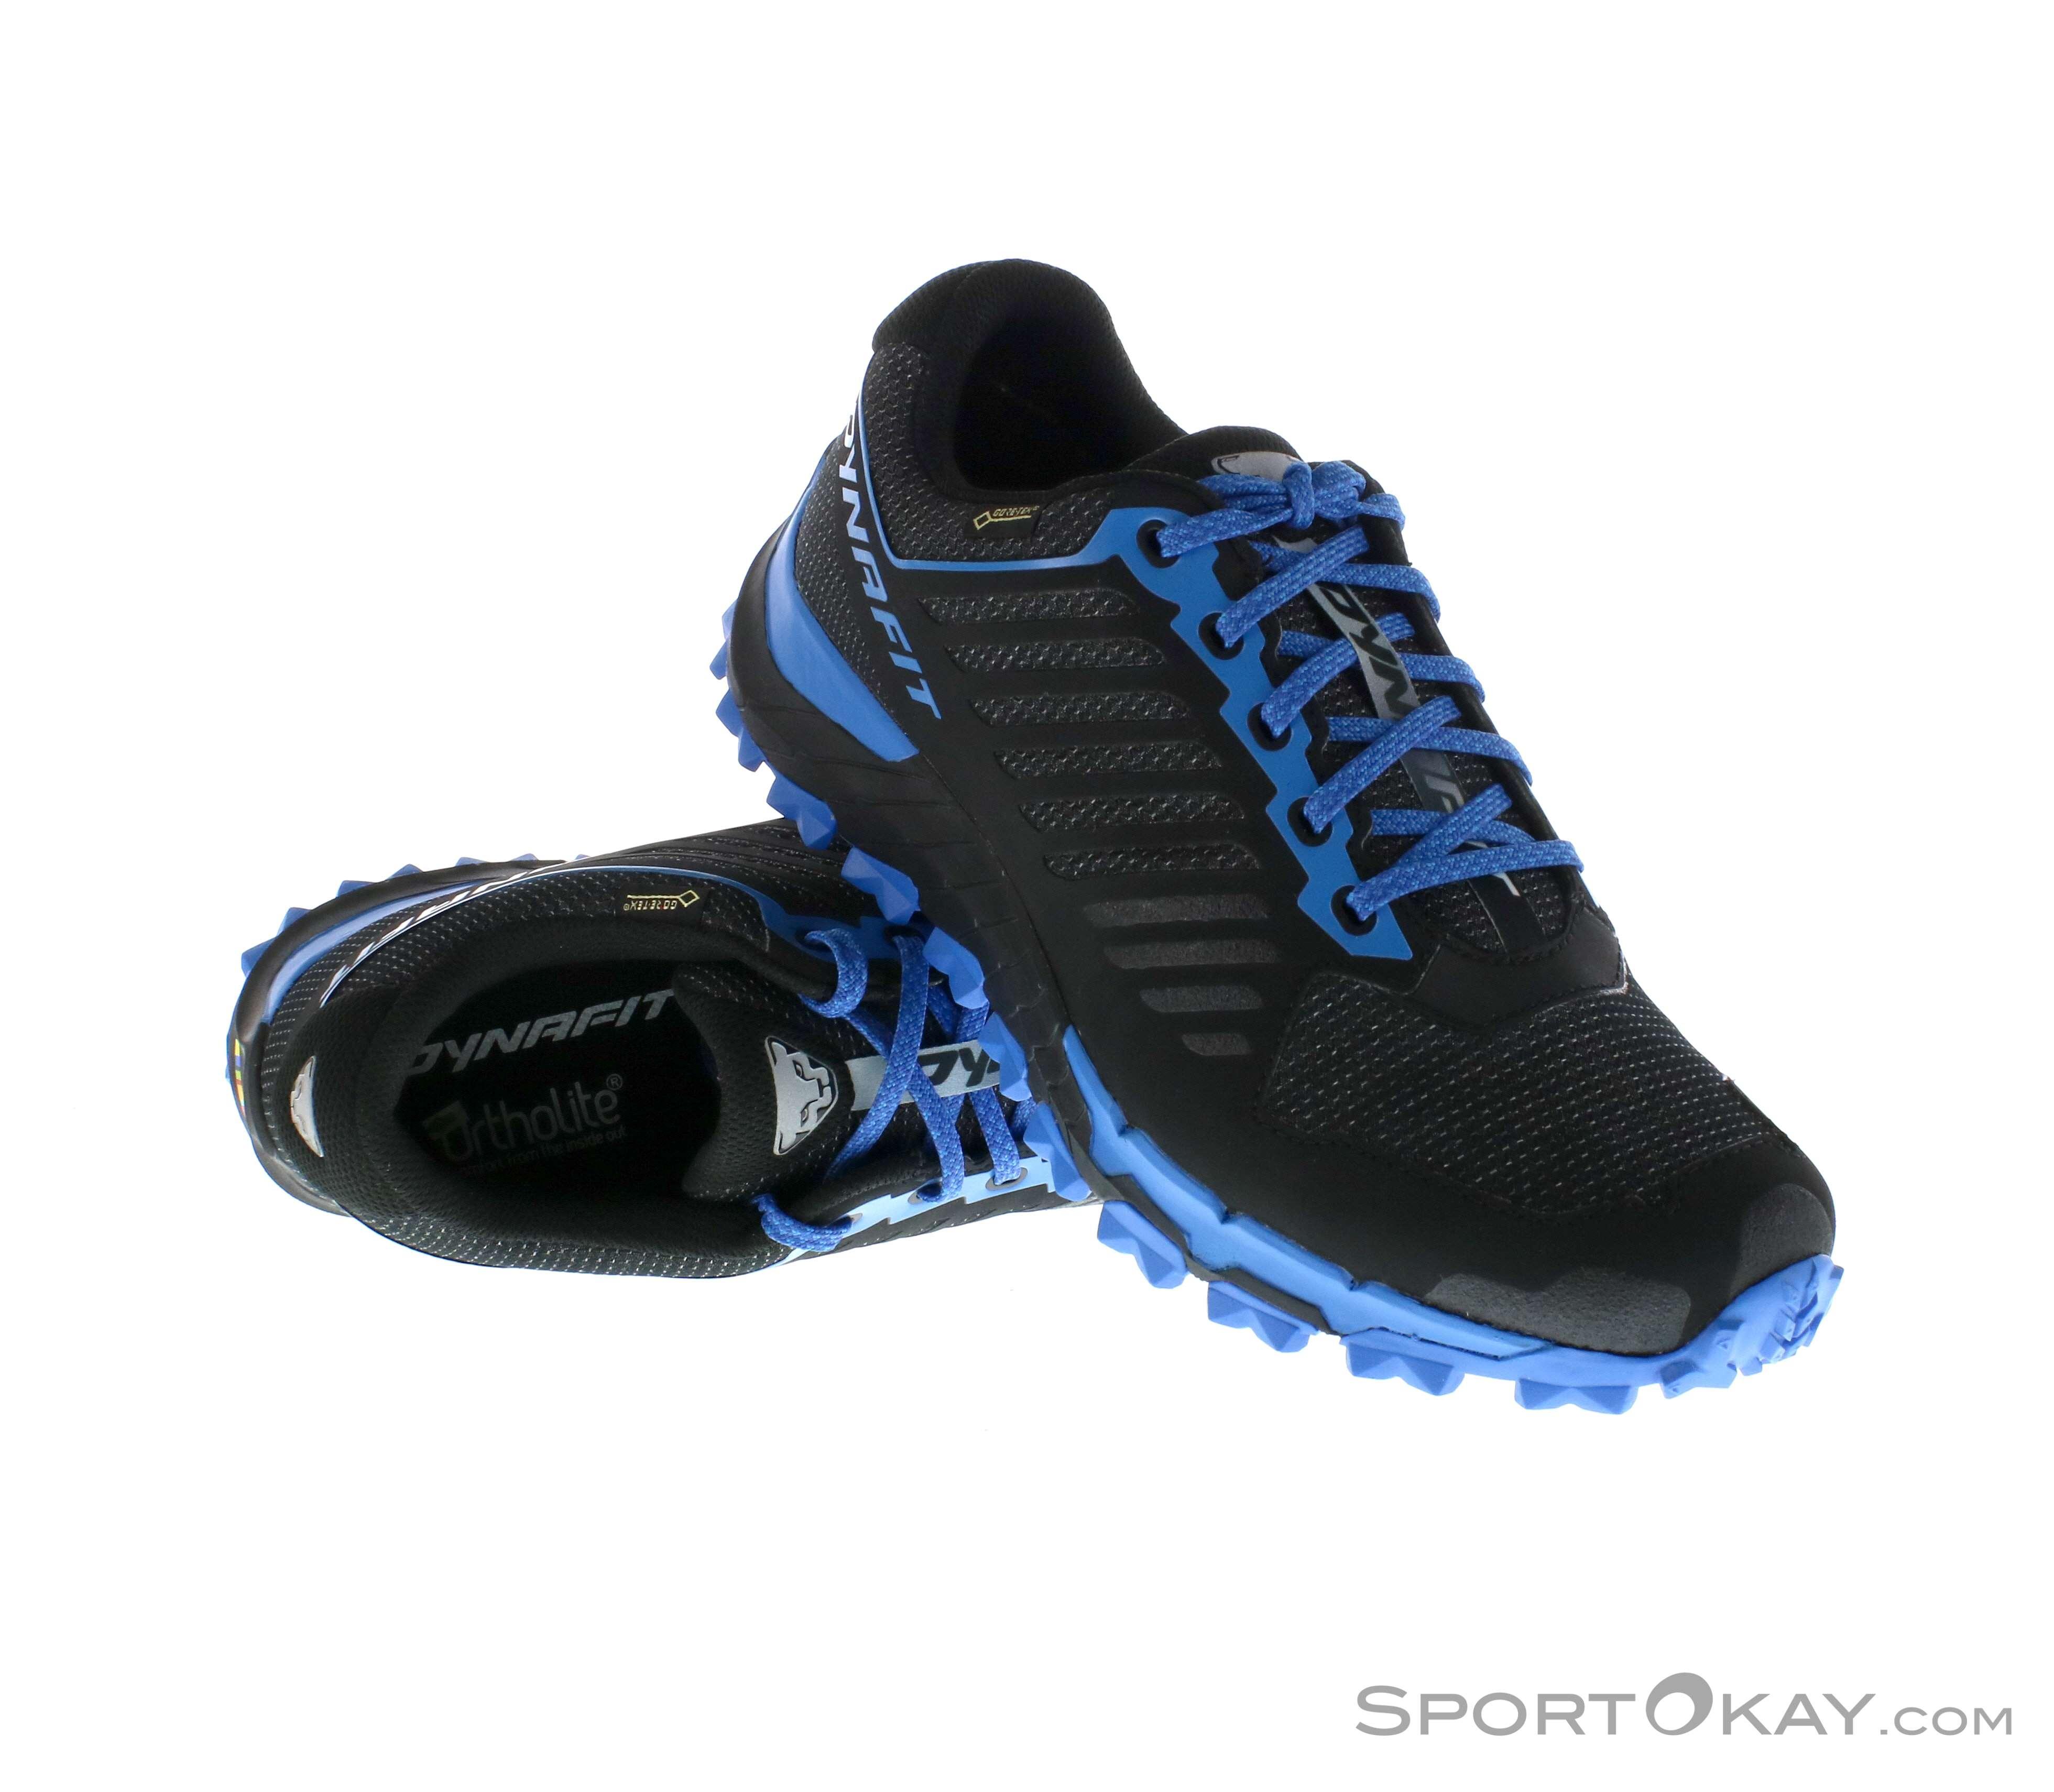 online retailer 1dd9b 42560 Dynafit Trailbreaker Mens Trail Running Shoes Gore-Tex, Dynafit, Black, ,  Male